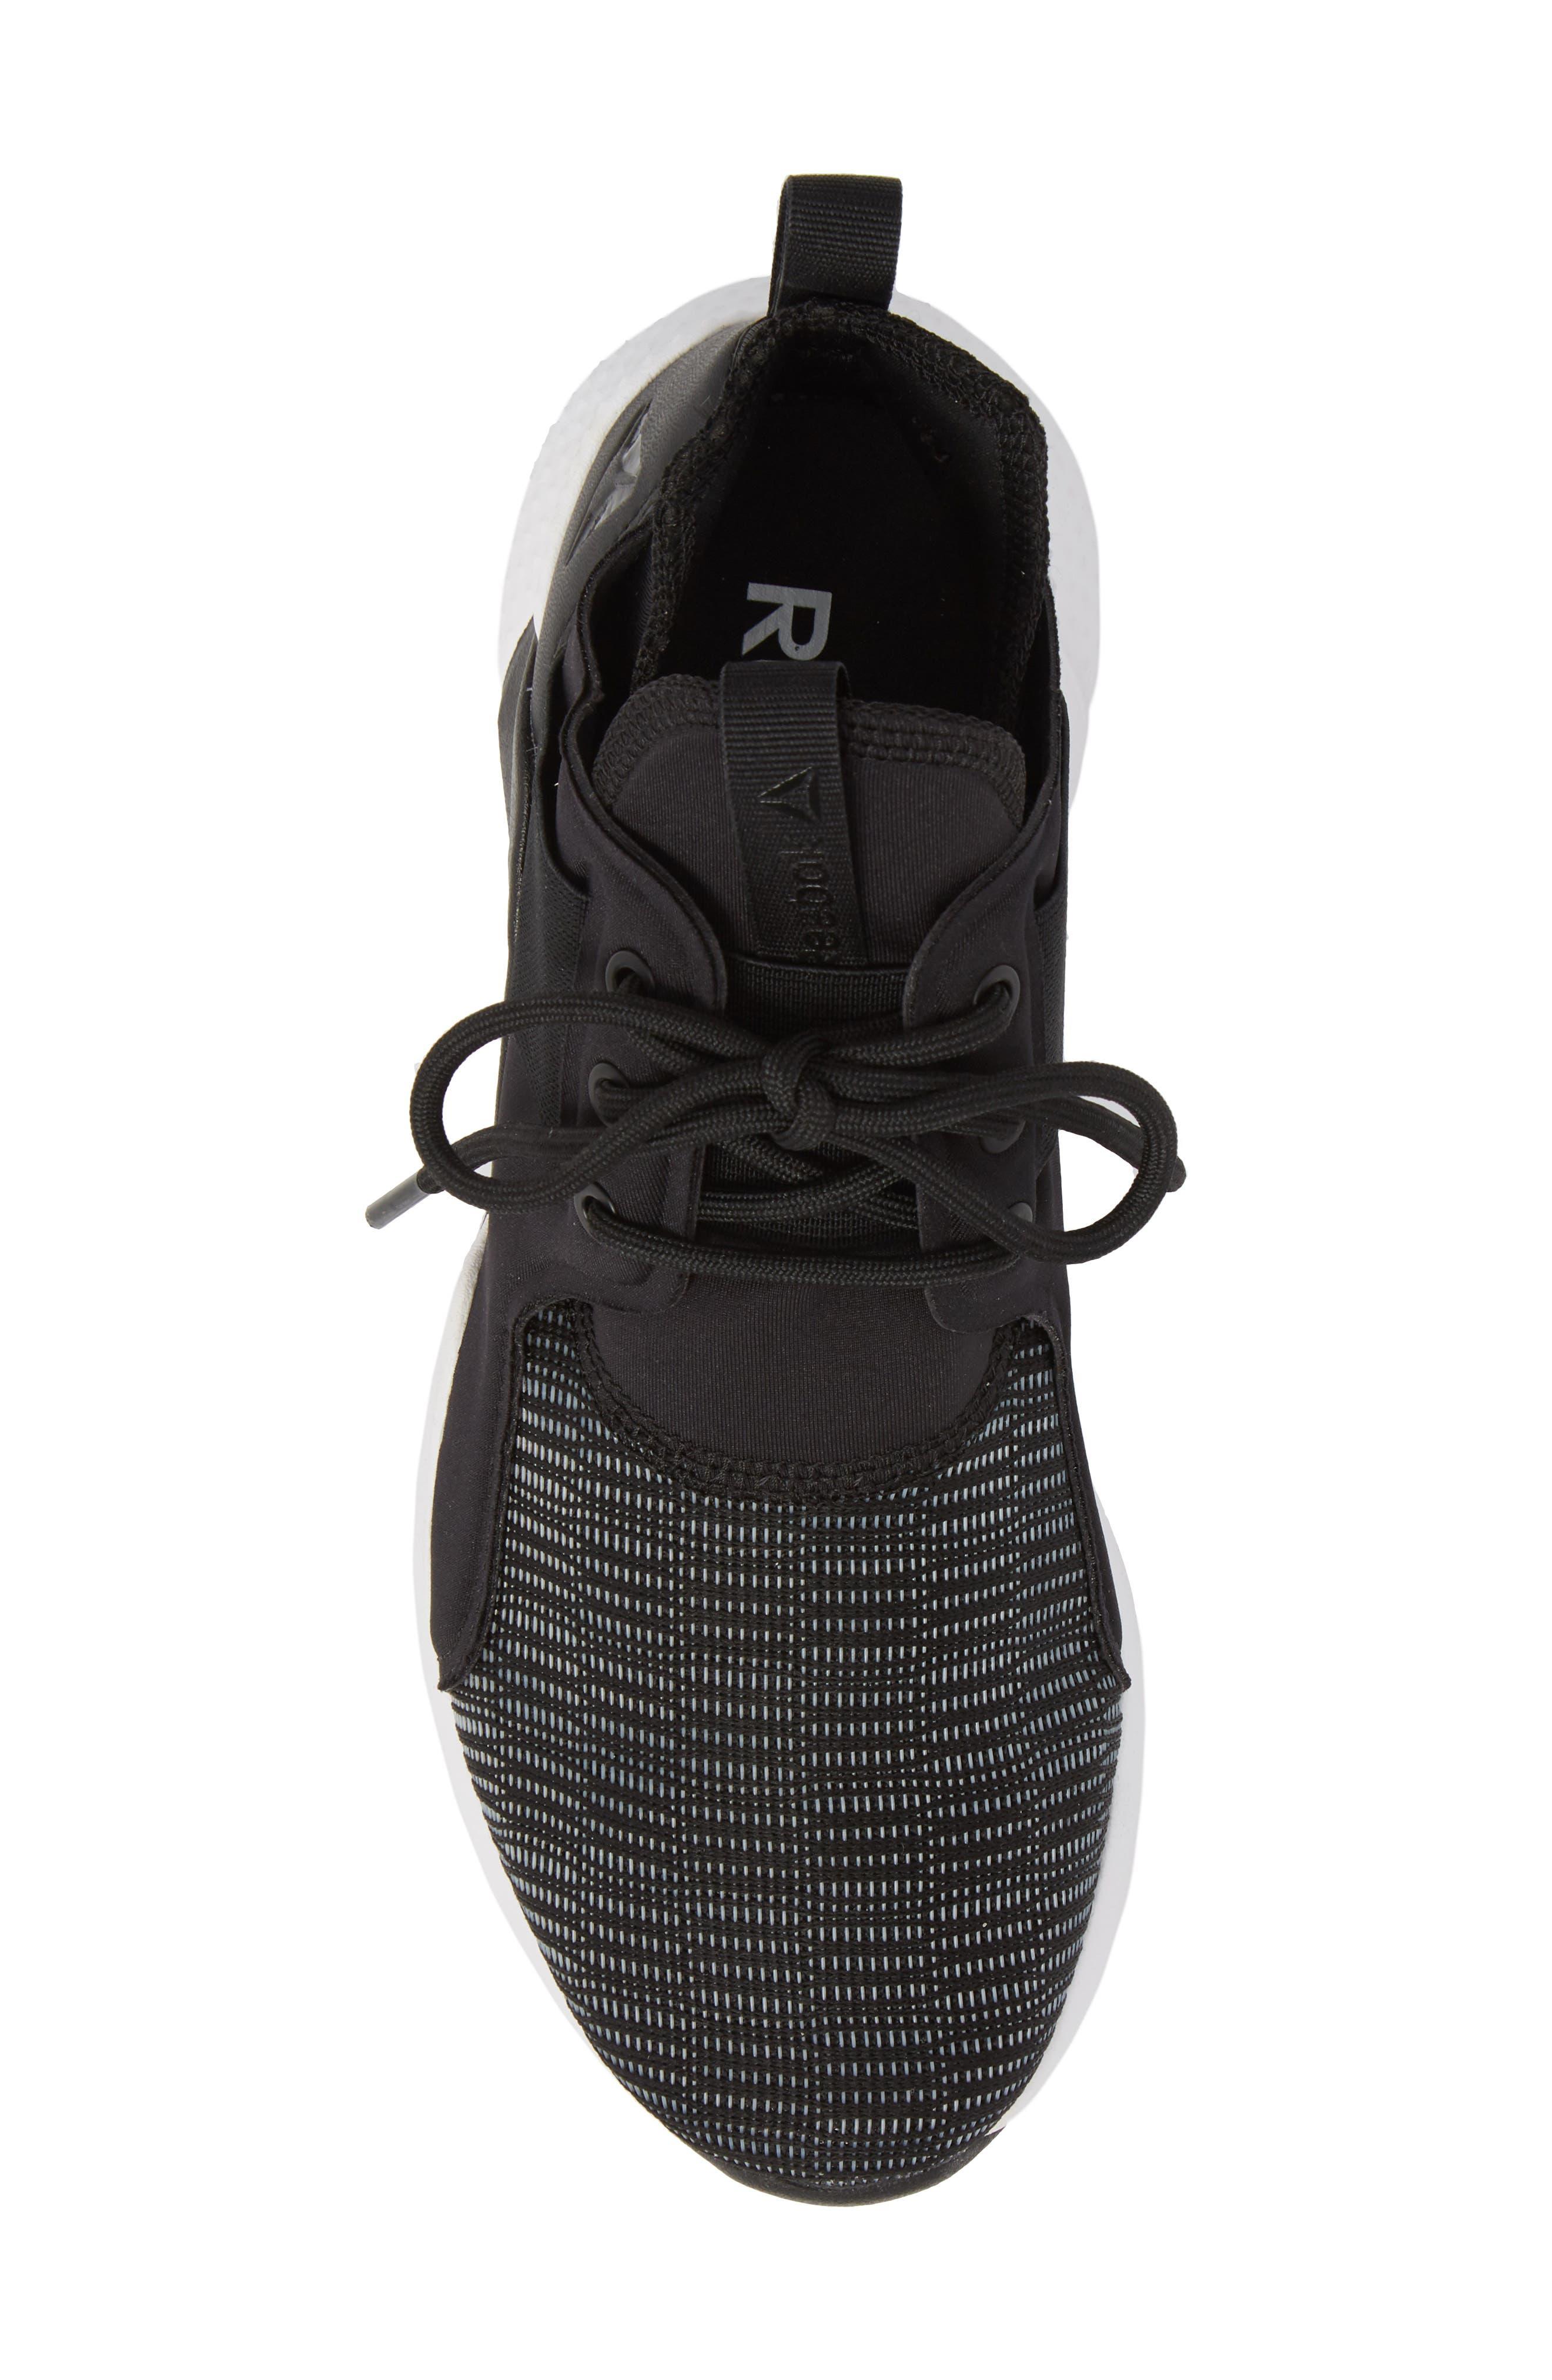 Guresu 1.0 High Top Sneaker,                             Alternate thumbnail 5, color,                             Black/ White